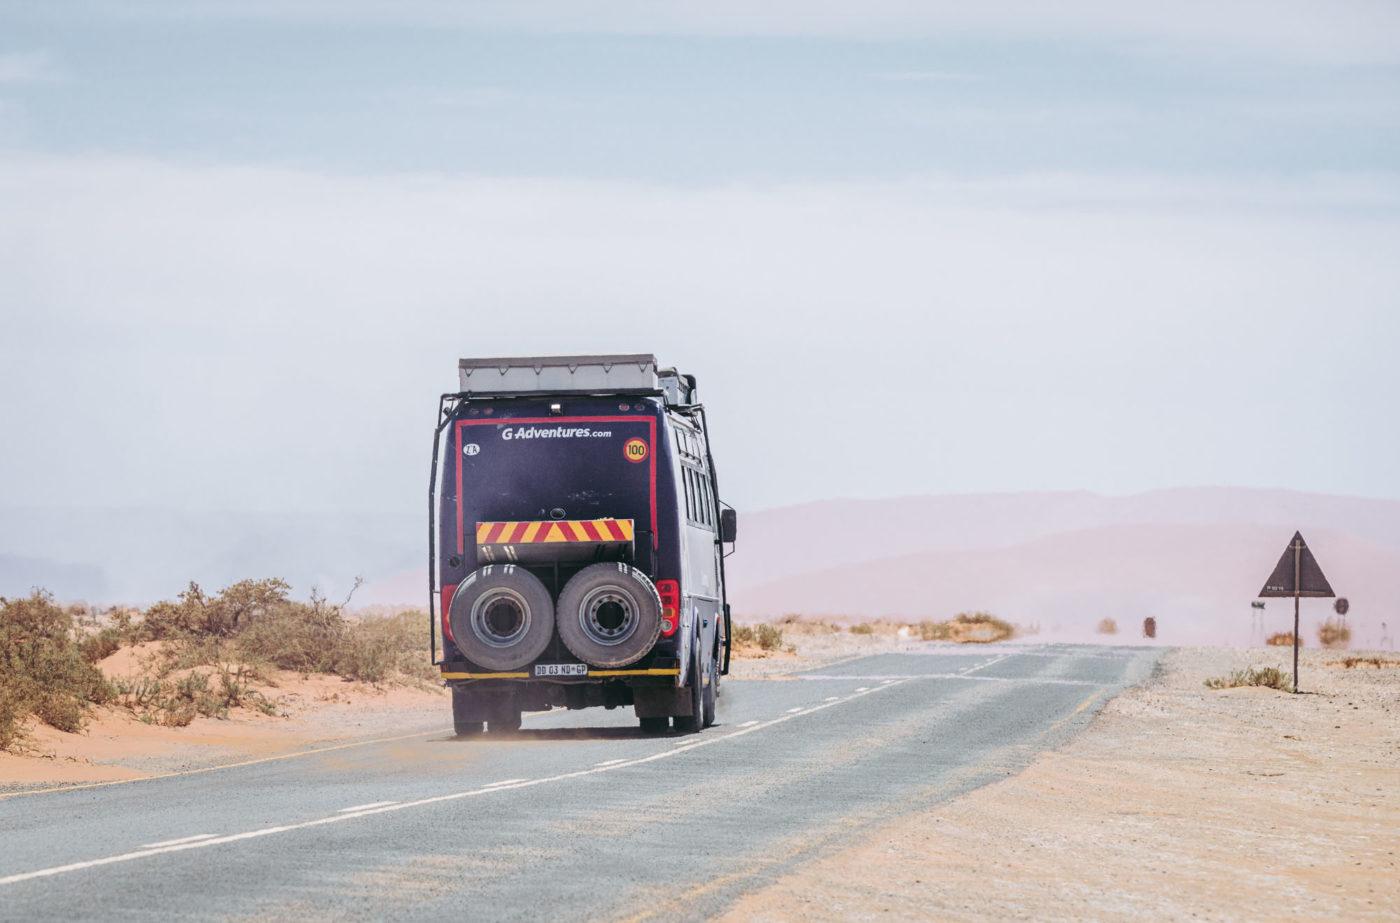 G Adventures Tour in Namibia